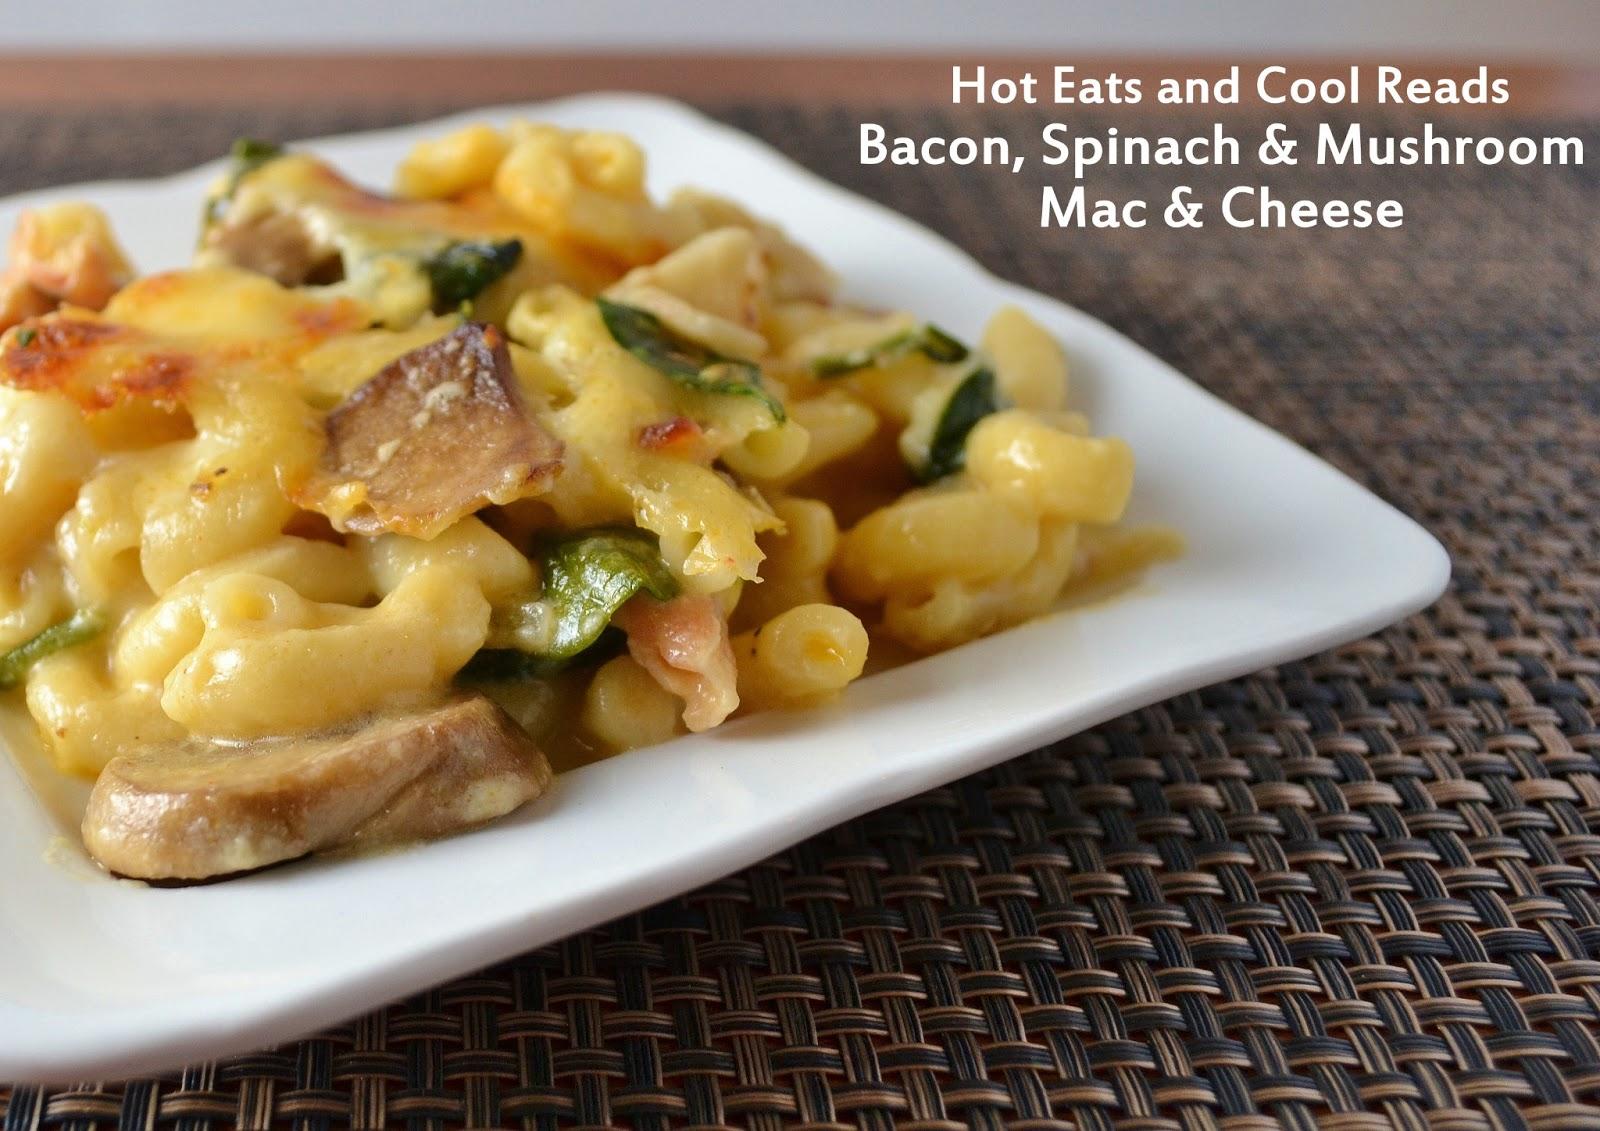 Spinach-Mushroom Mac and Cheese